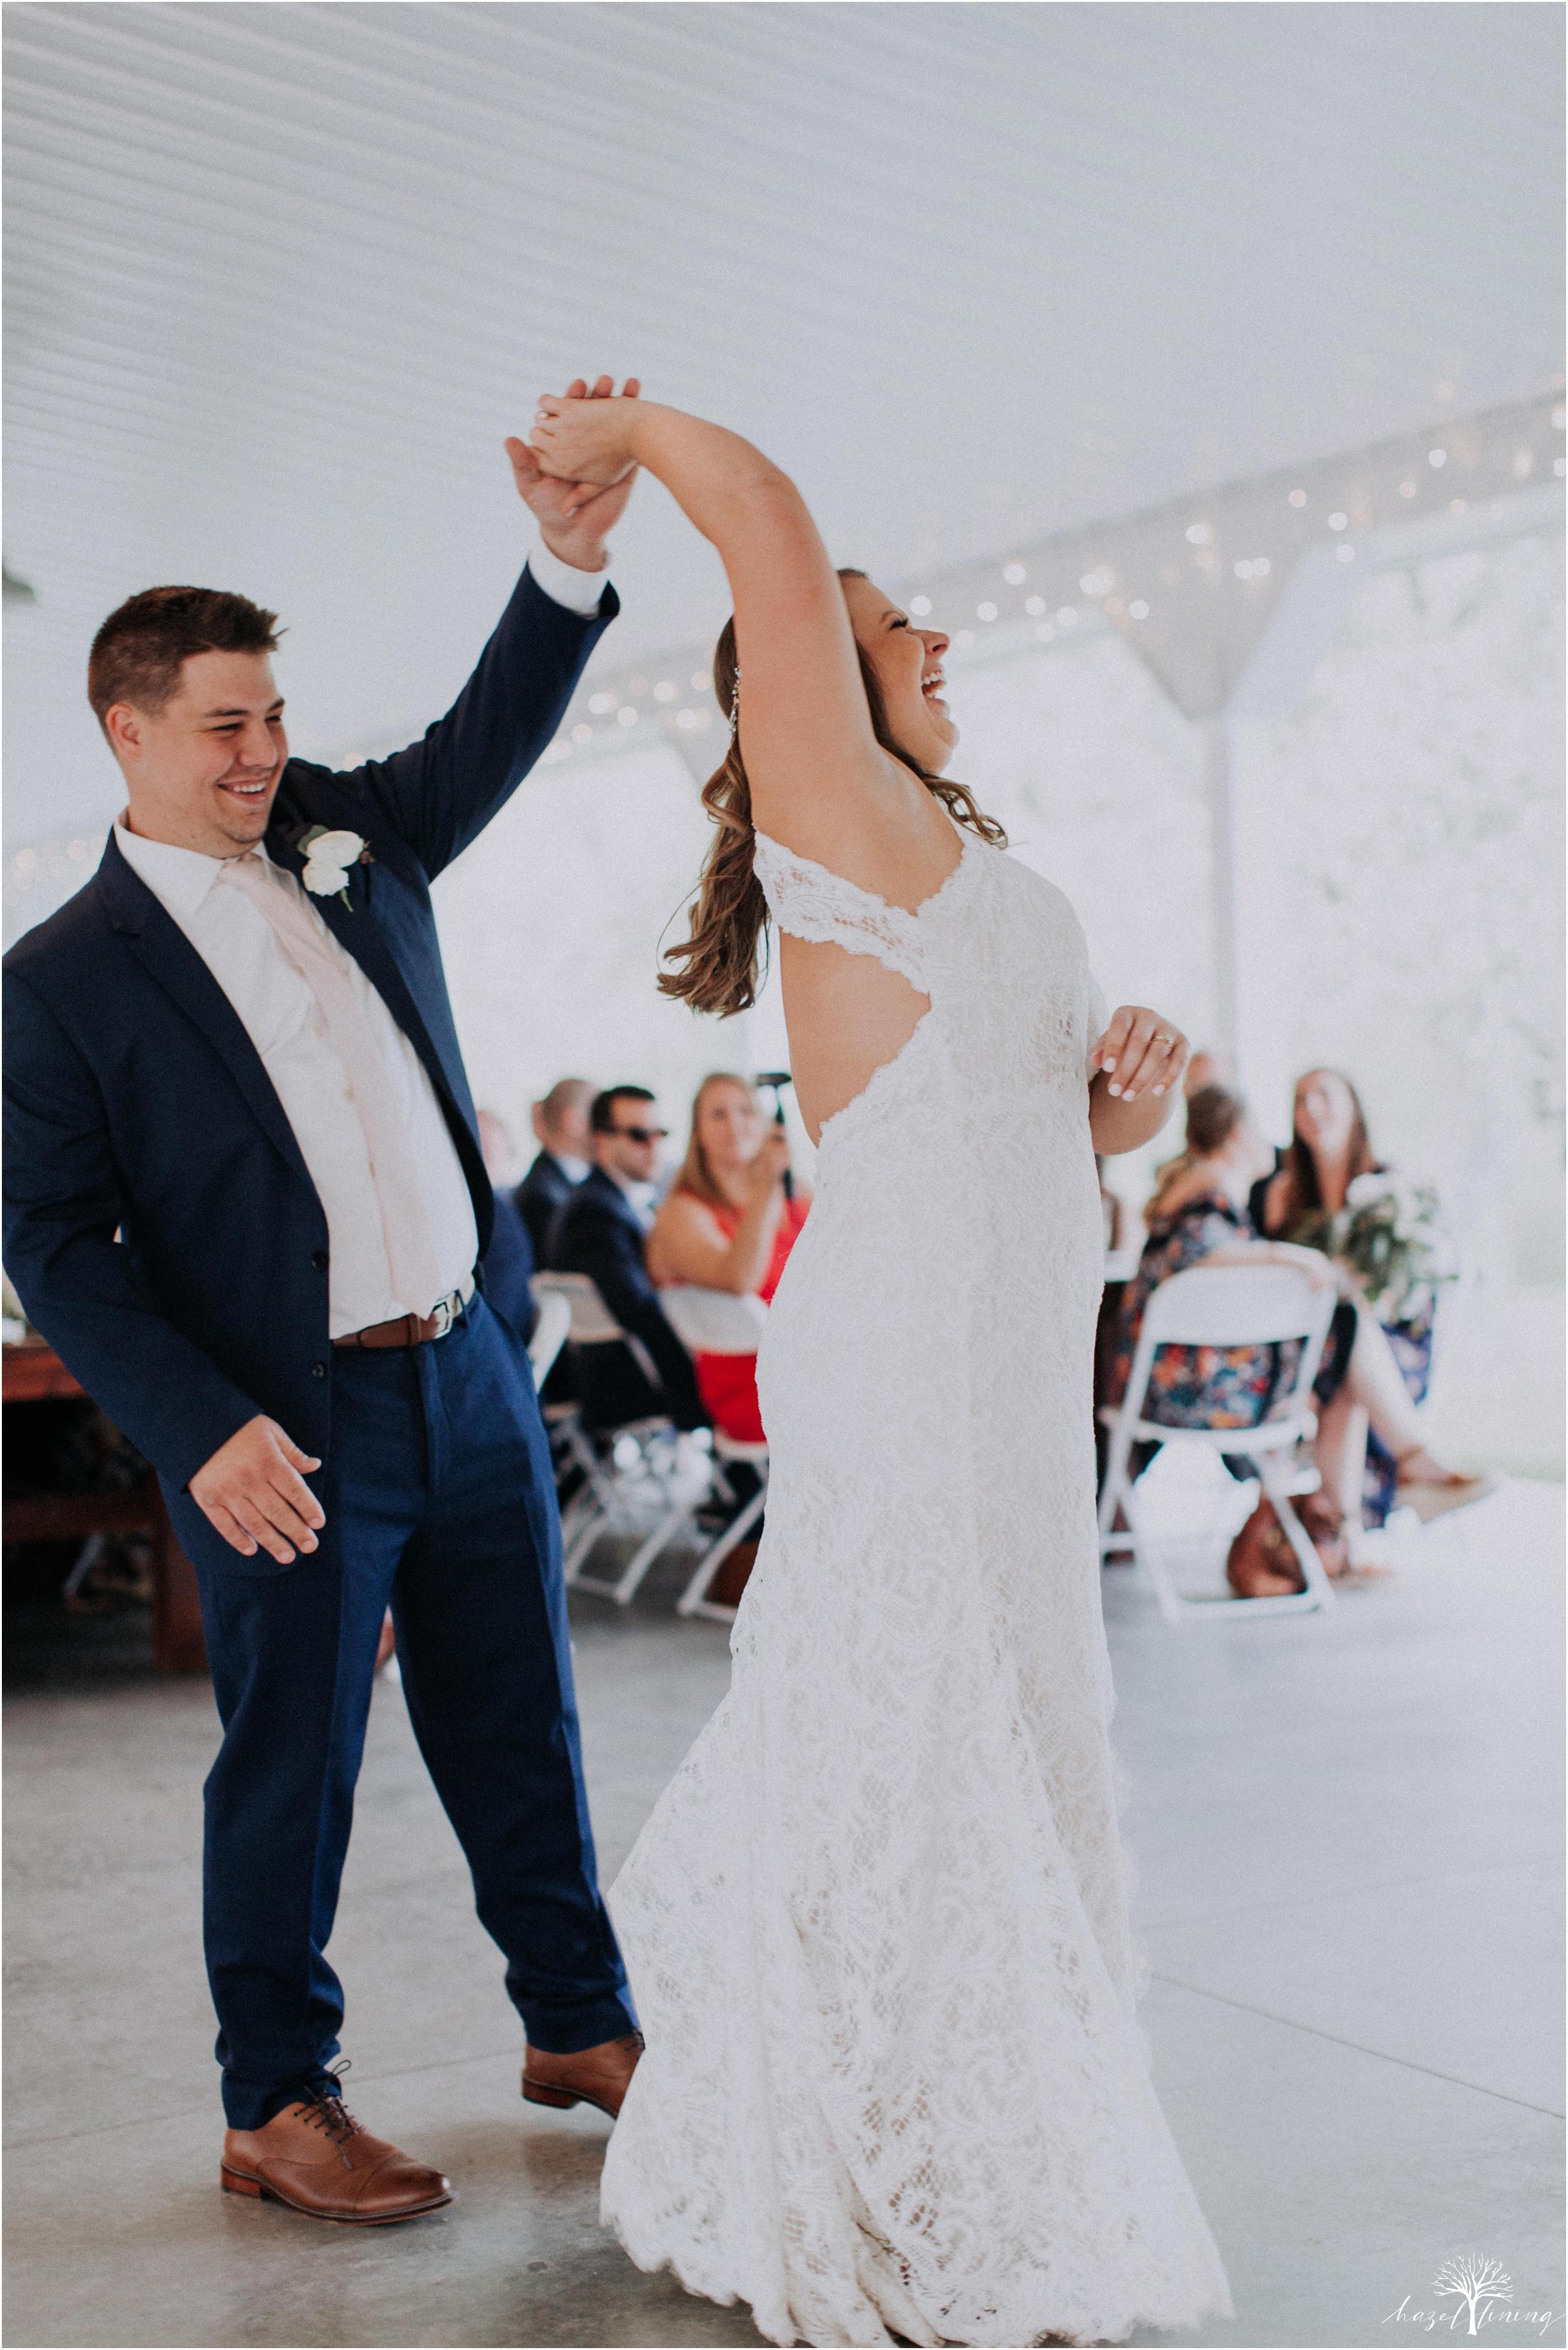 hazel-lining-travel-wedding-elopement-photography-abby-skyler-hunt-the-willis-house-york-pennsylvania-outdoor-estate-wedding_0112.jpg